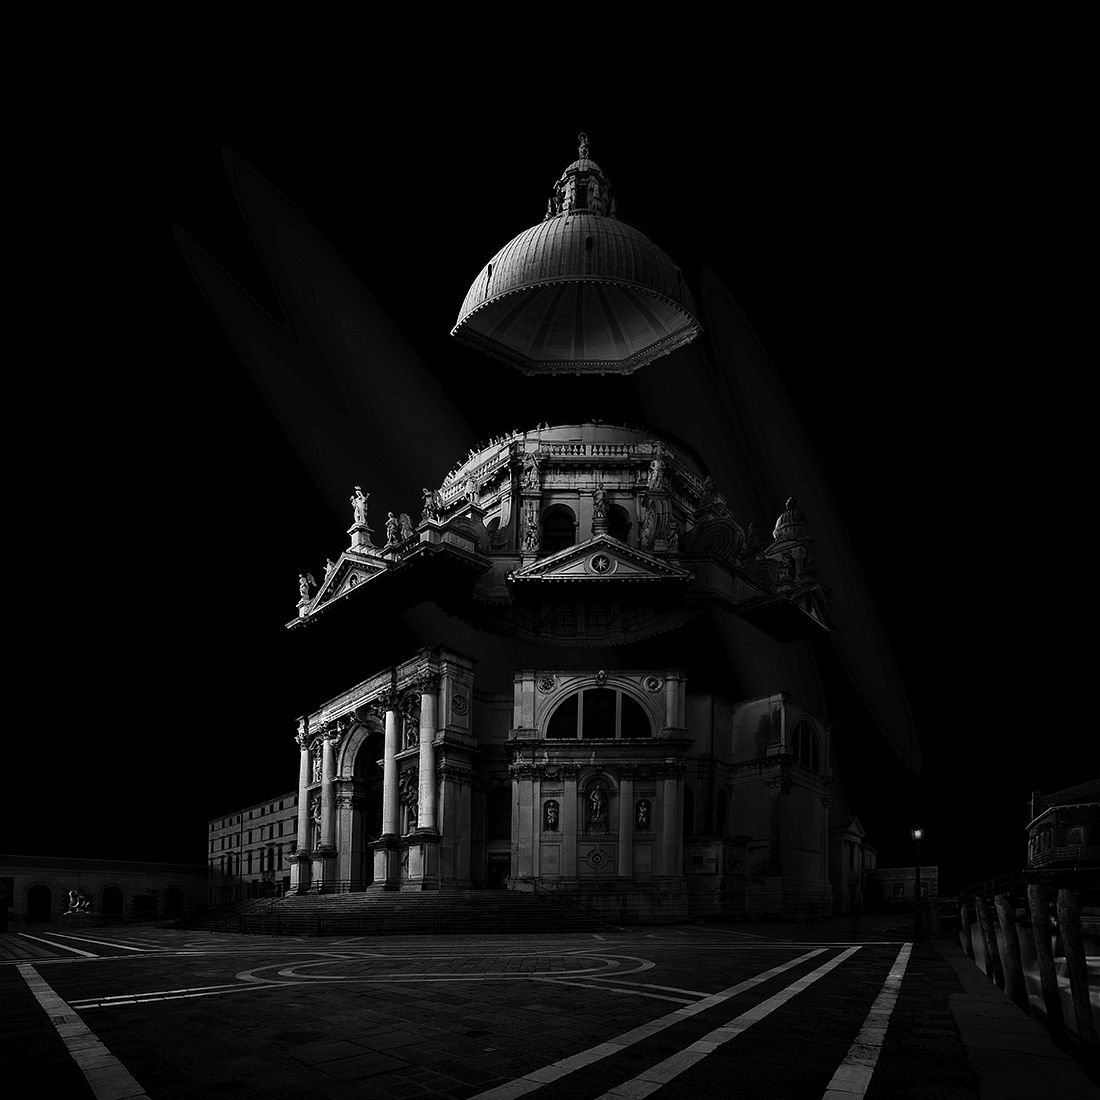 © Daniel Garay Arango: GRVTY2 / MonoVisions Photography Awards 2018 winner